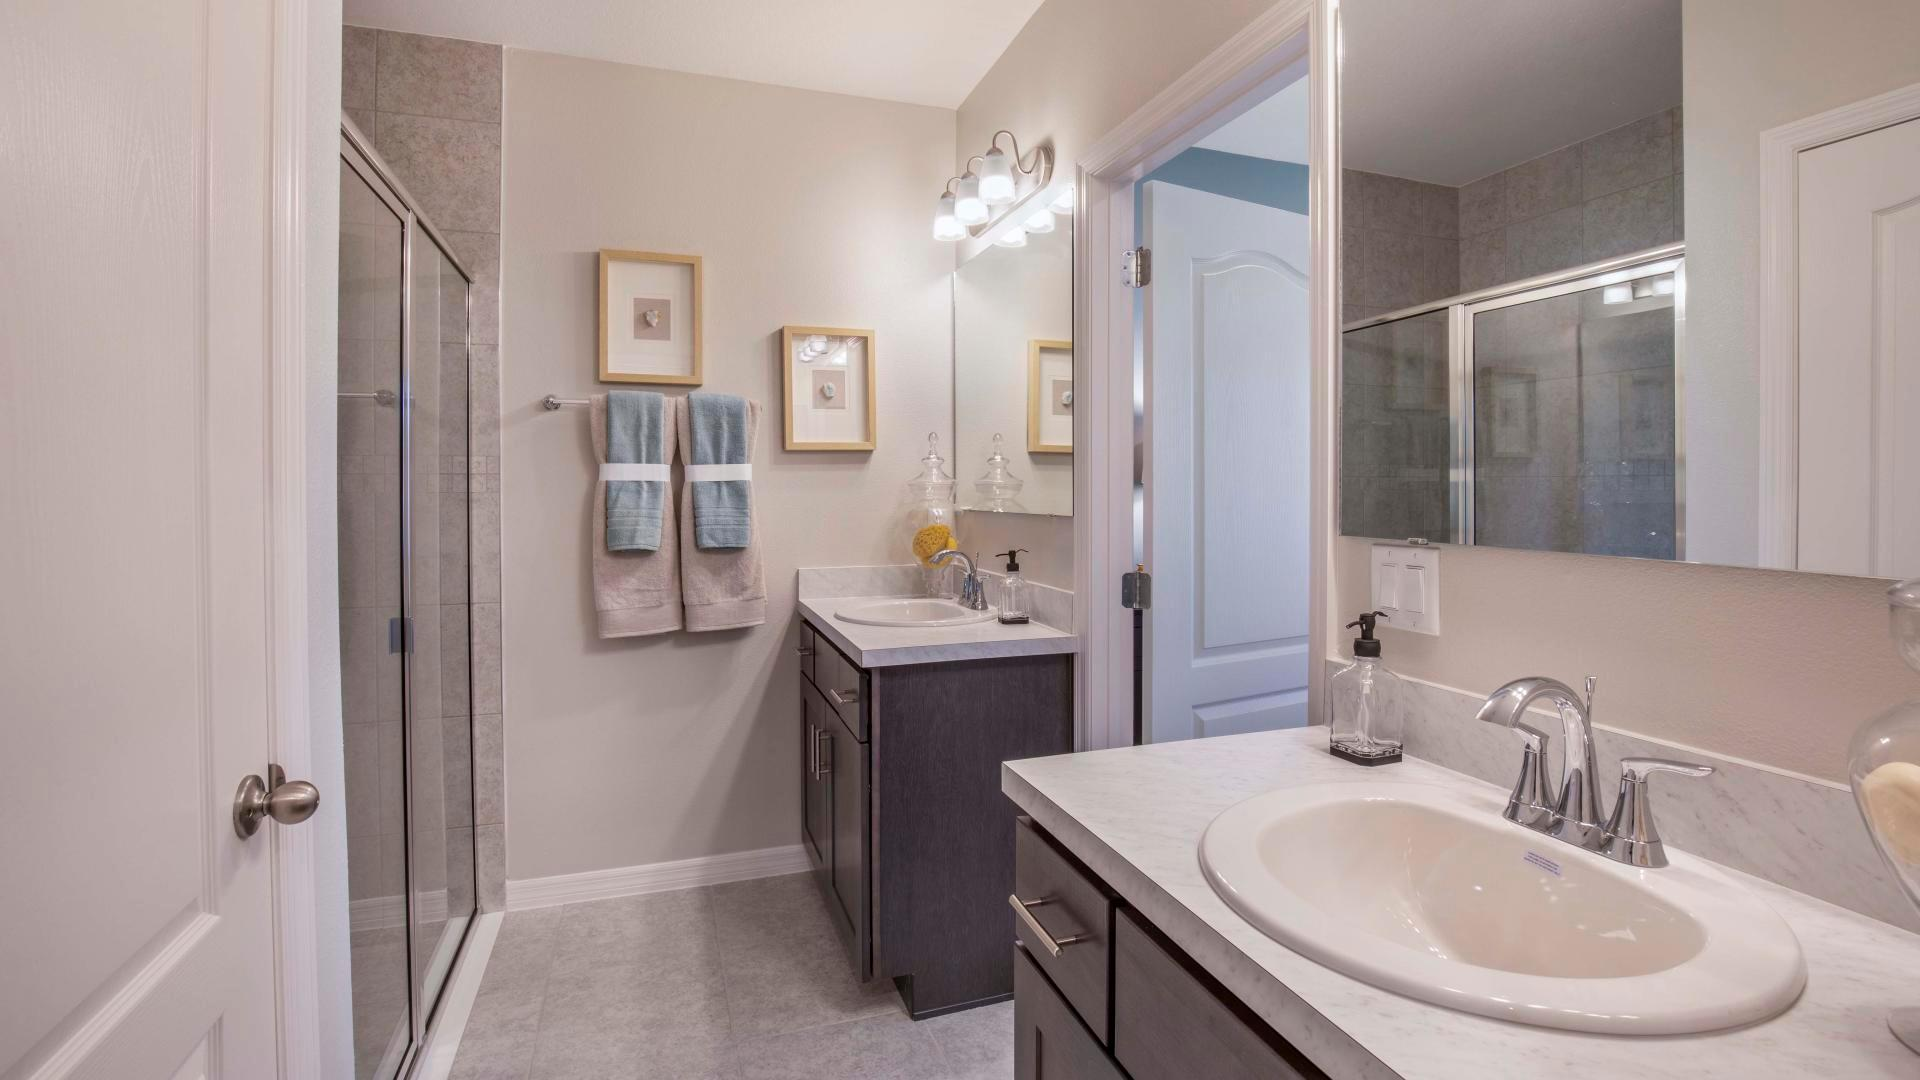 Bathroom featured in the Victoria By Maronda Homes in Daytona Beach, FL